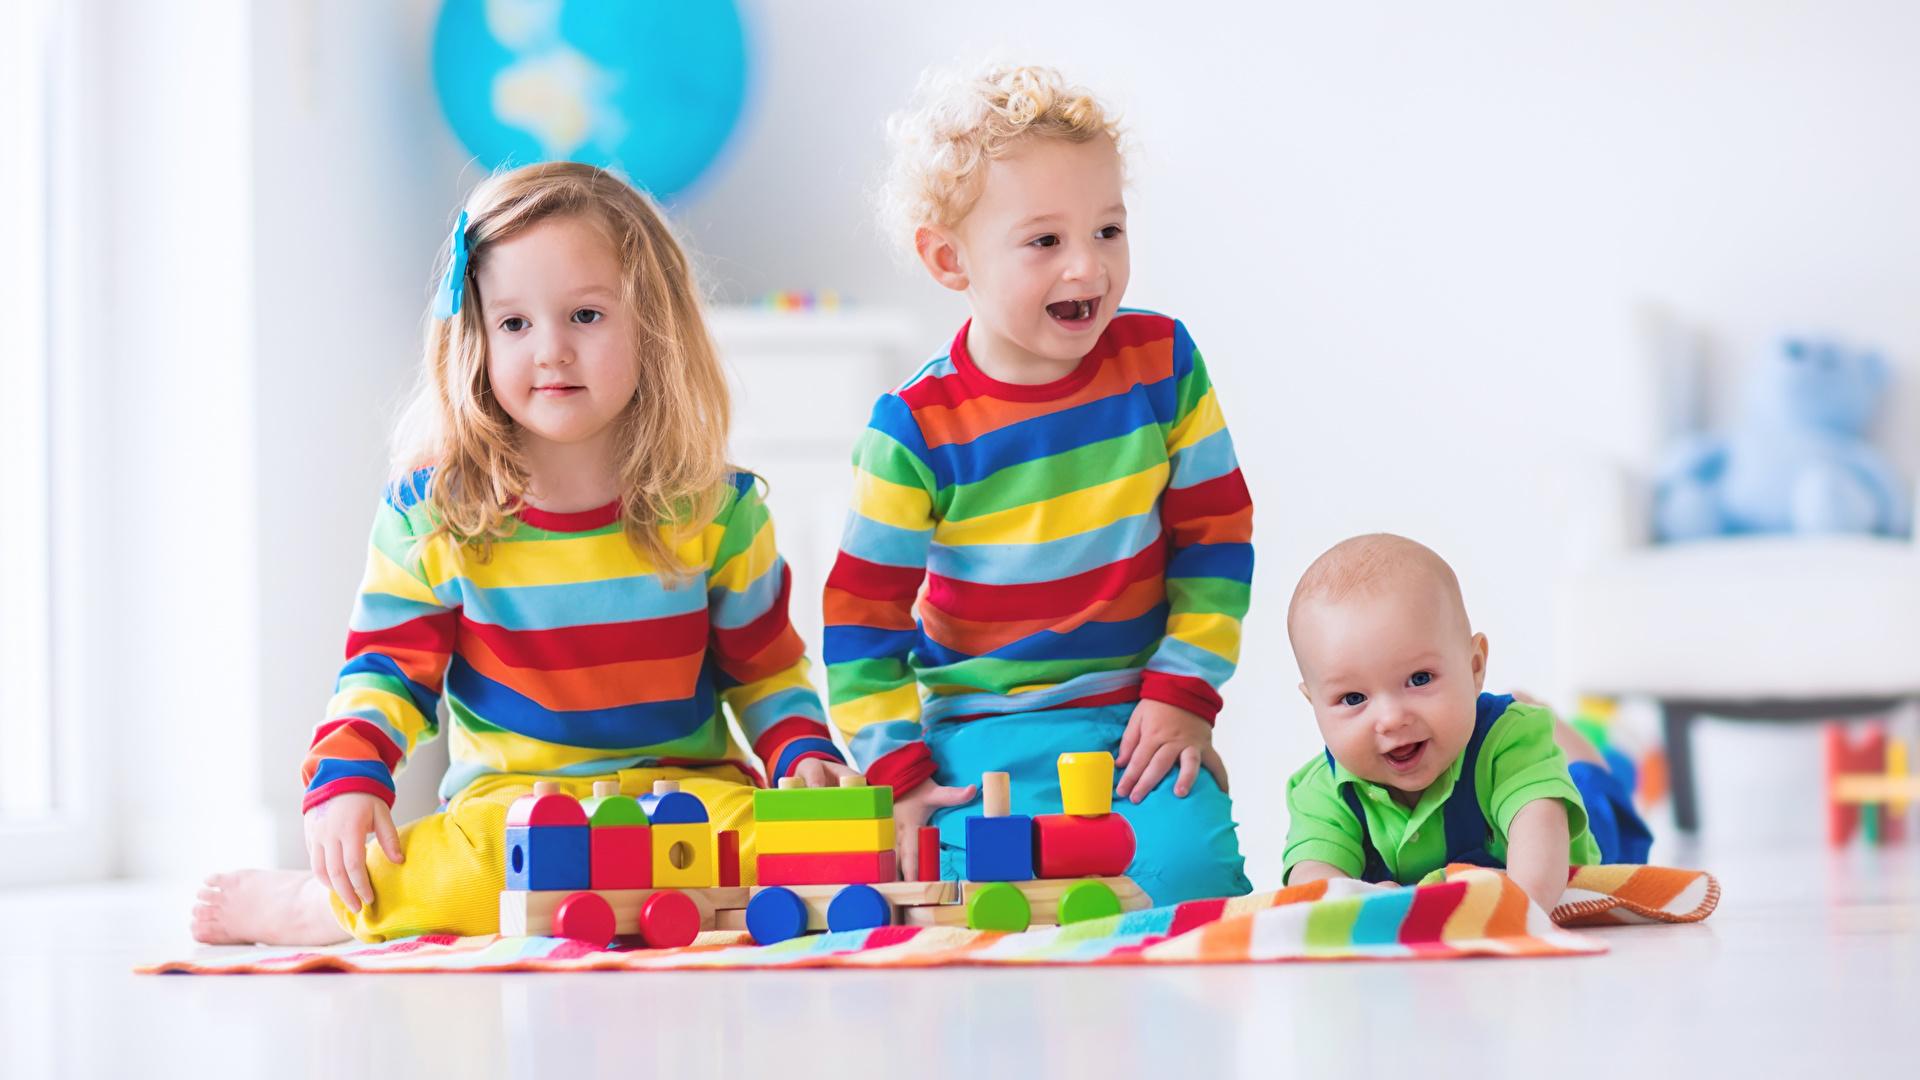 Little girls Boys Infants joyful Children Three 3